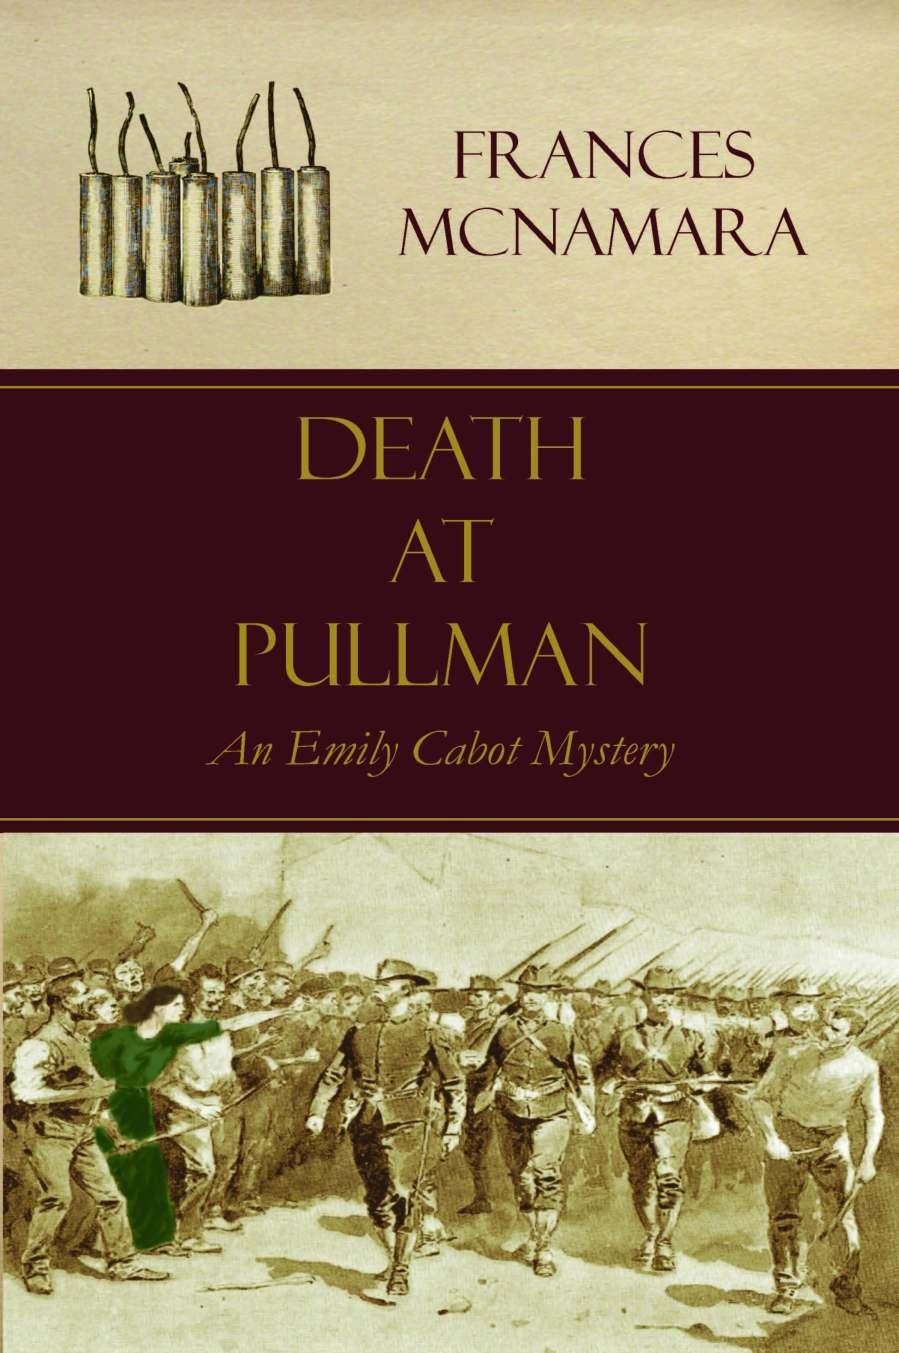 Death at Pullman